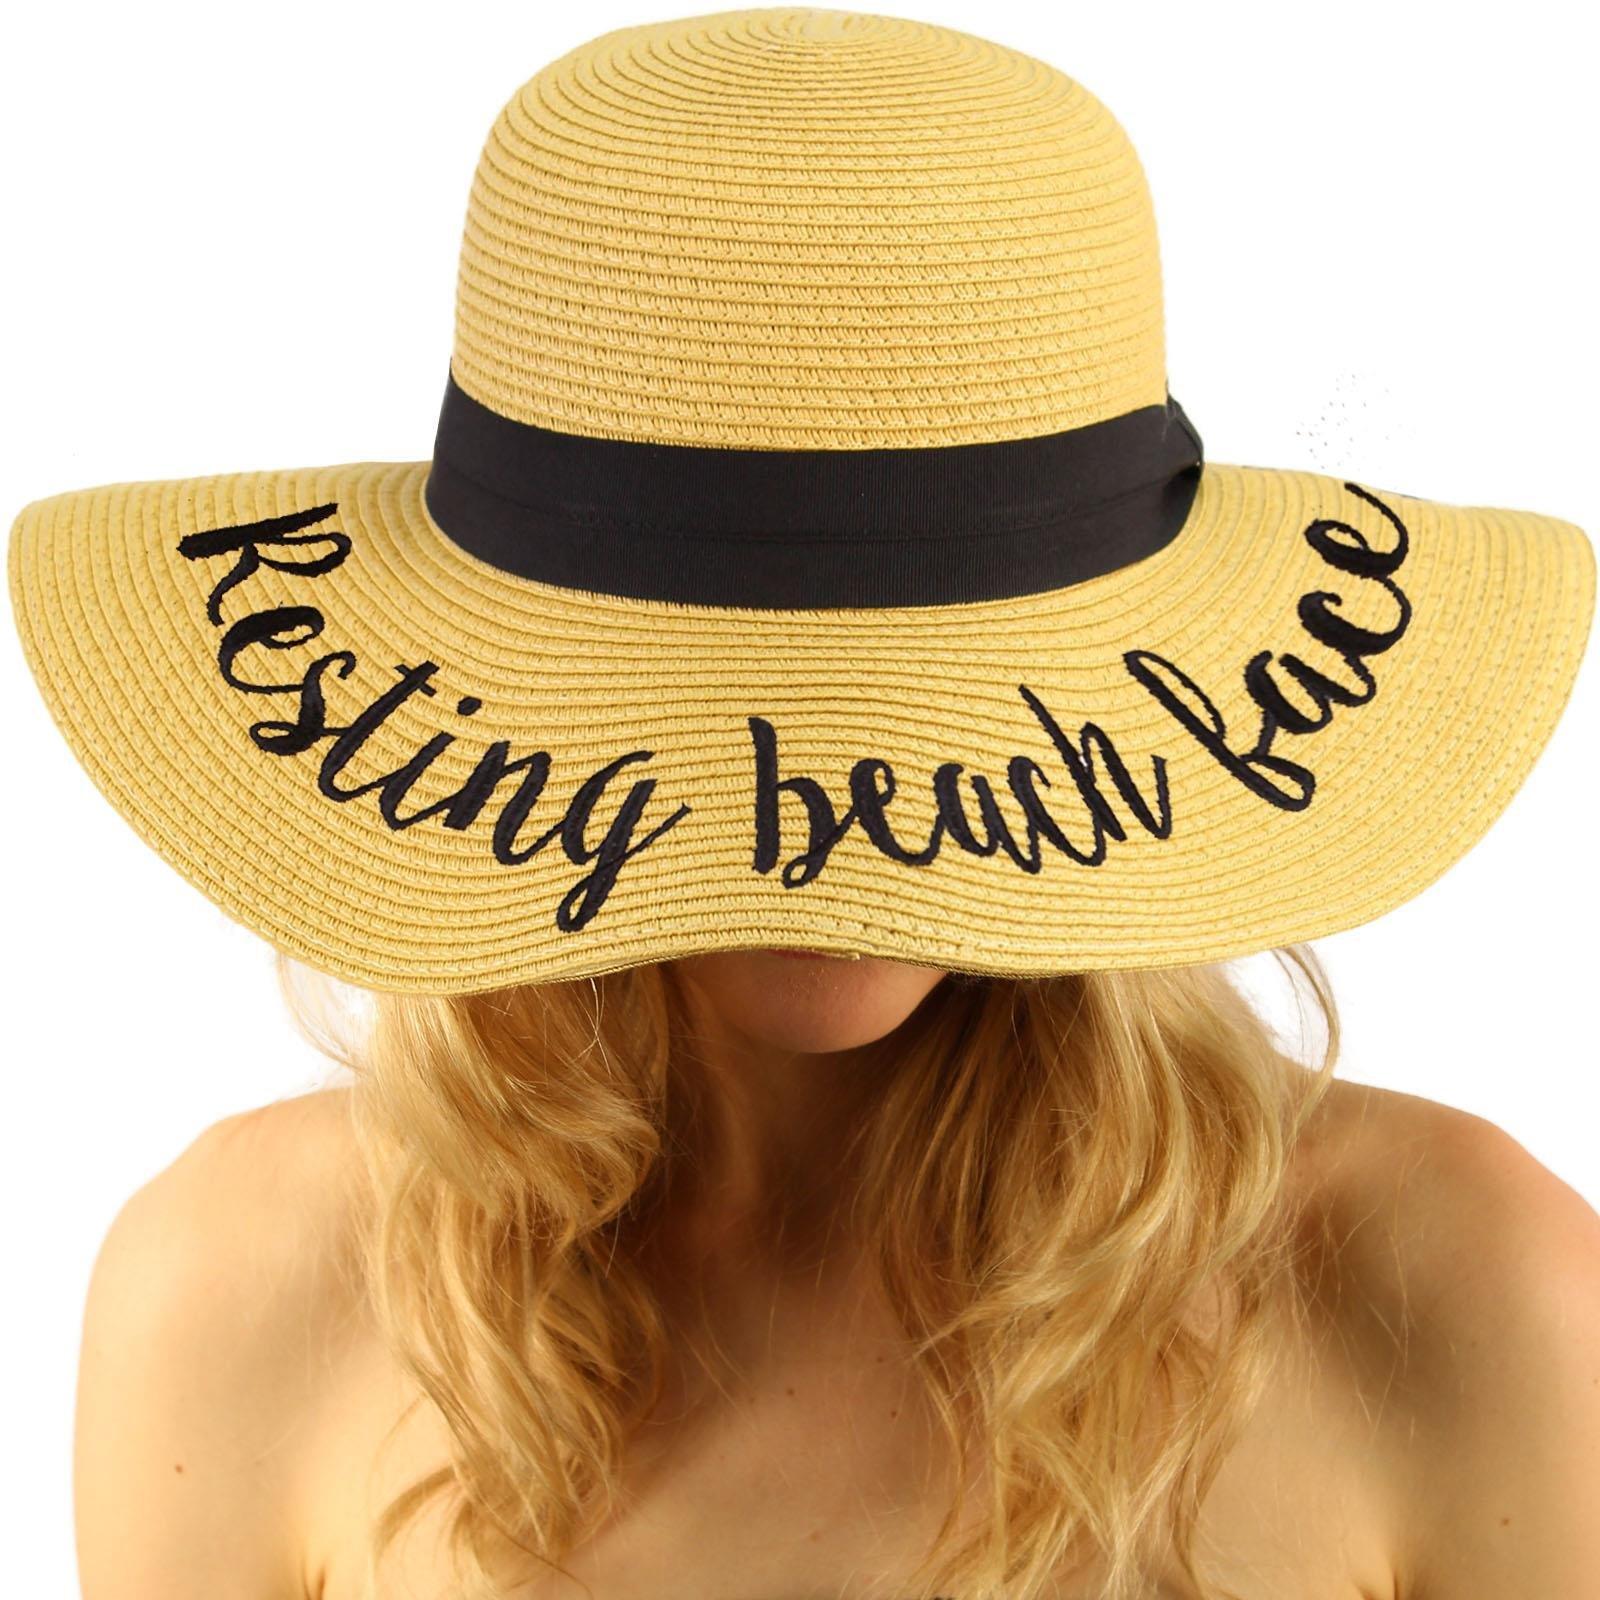 C.C Fun Verbiage Elegant Wide Brim 4 Summer Derby Beach Pool Floppy Dress Sun Hat Natural (R)